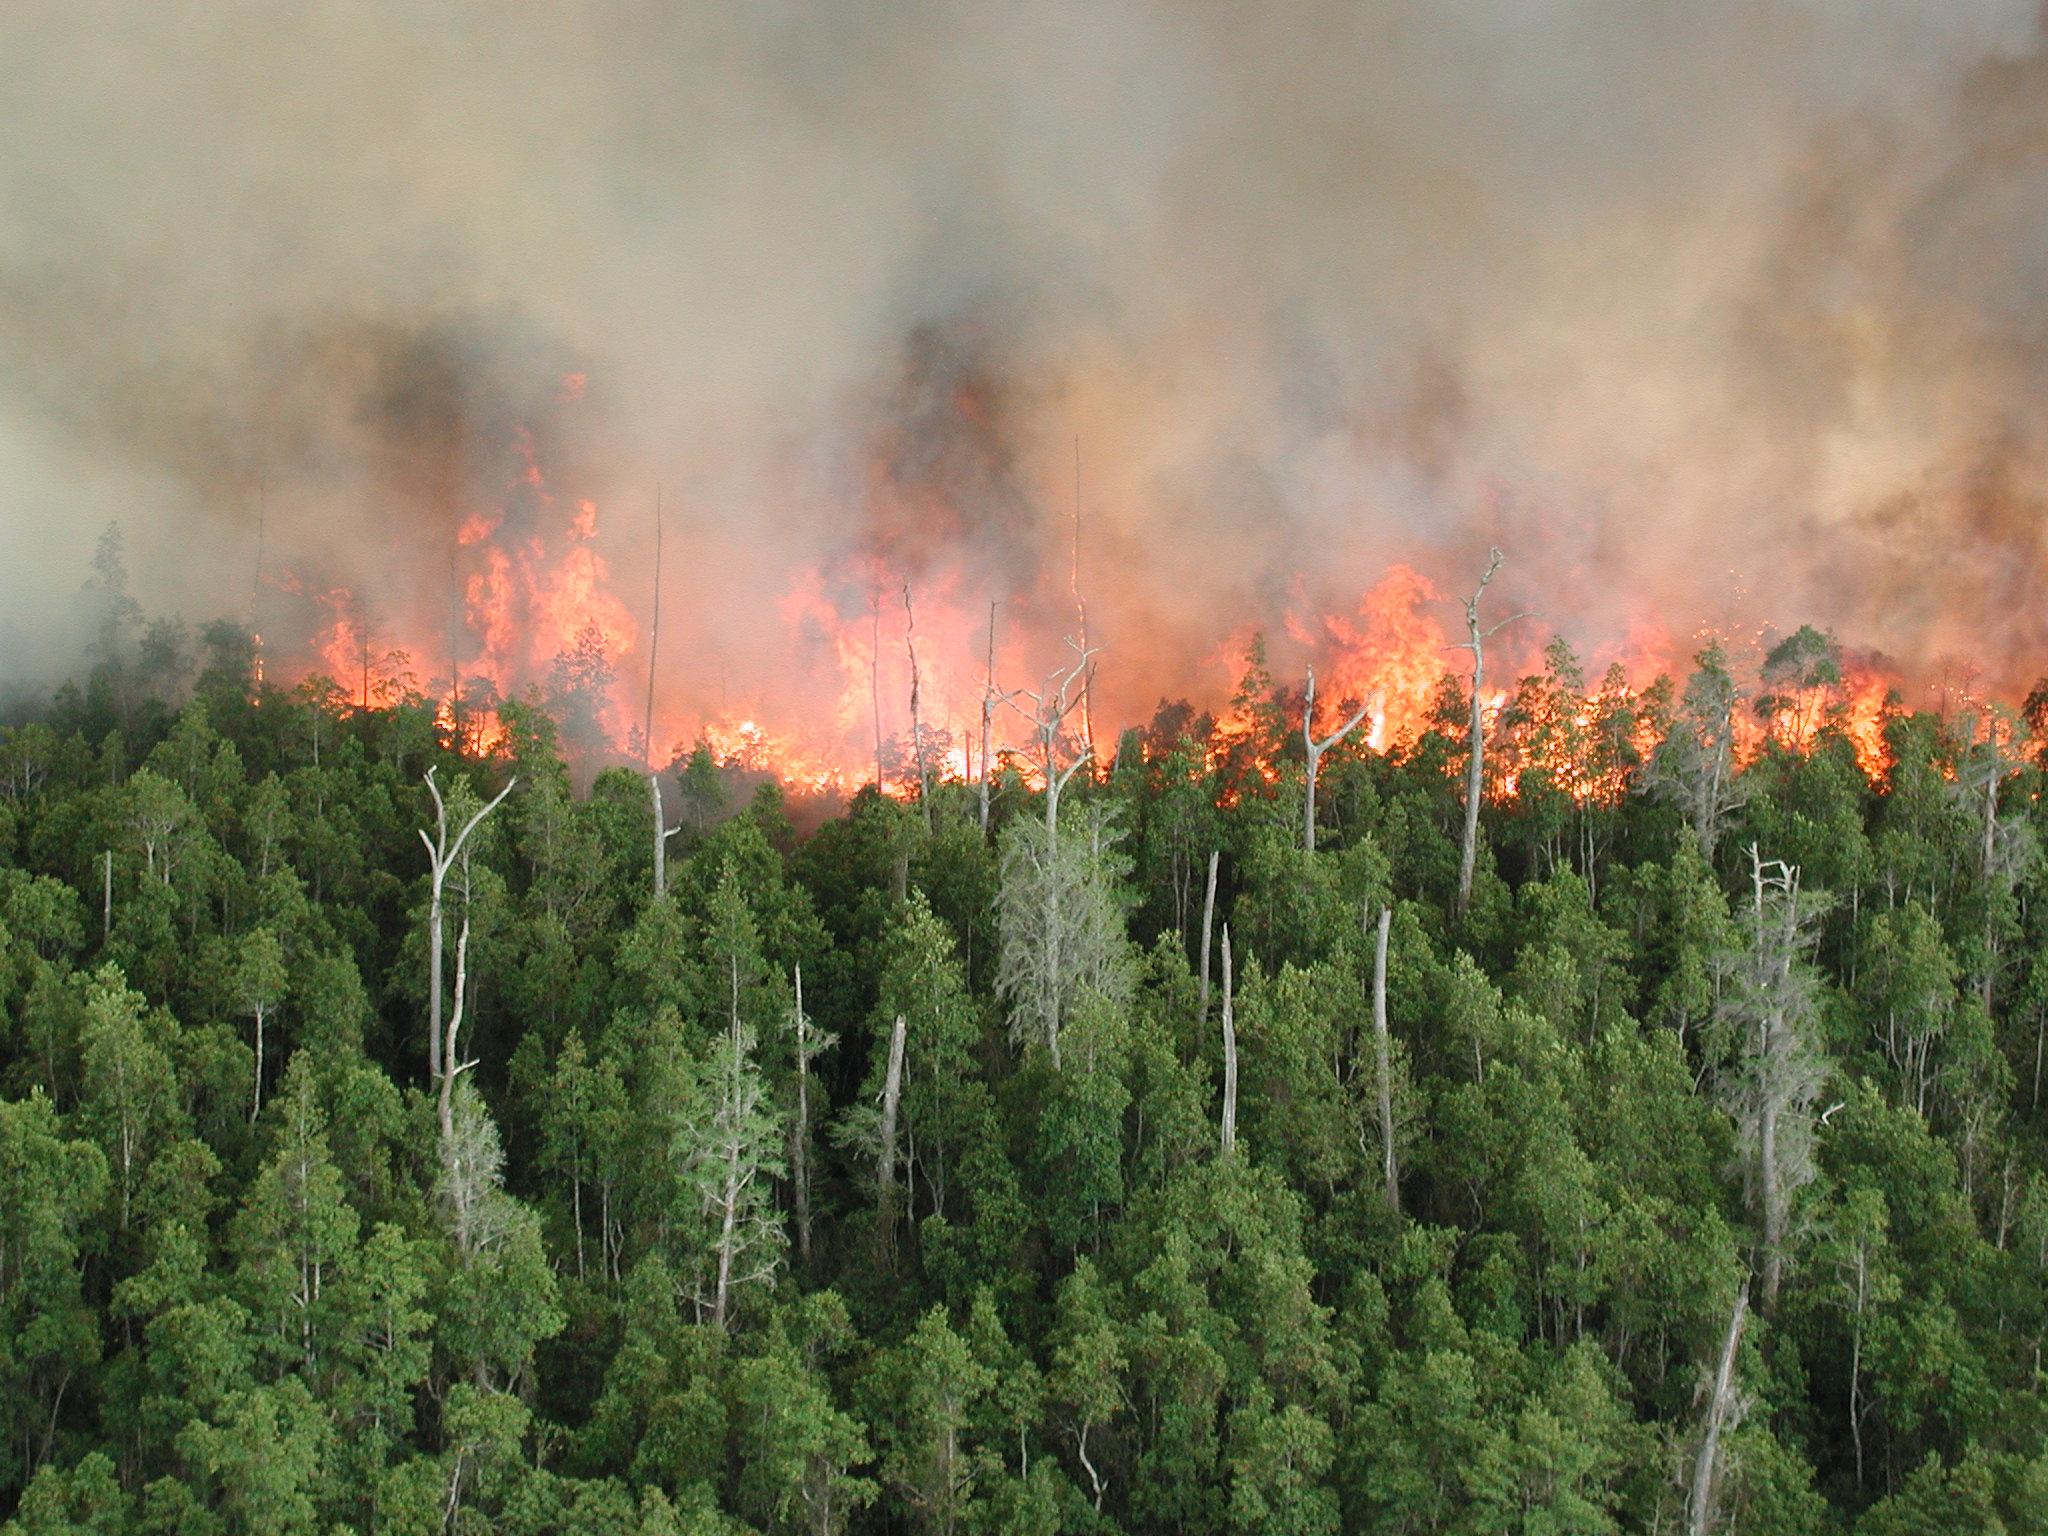 Wildfire burns forest landscape